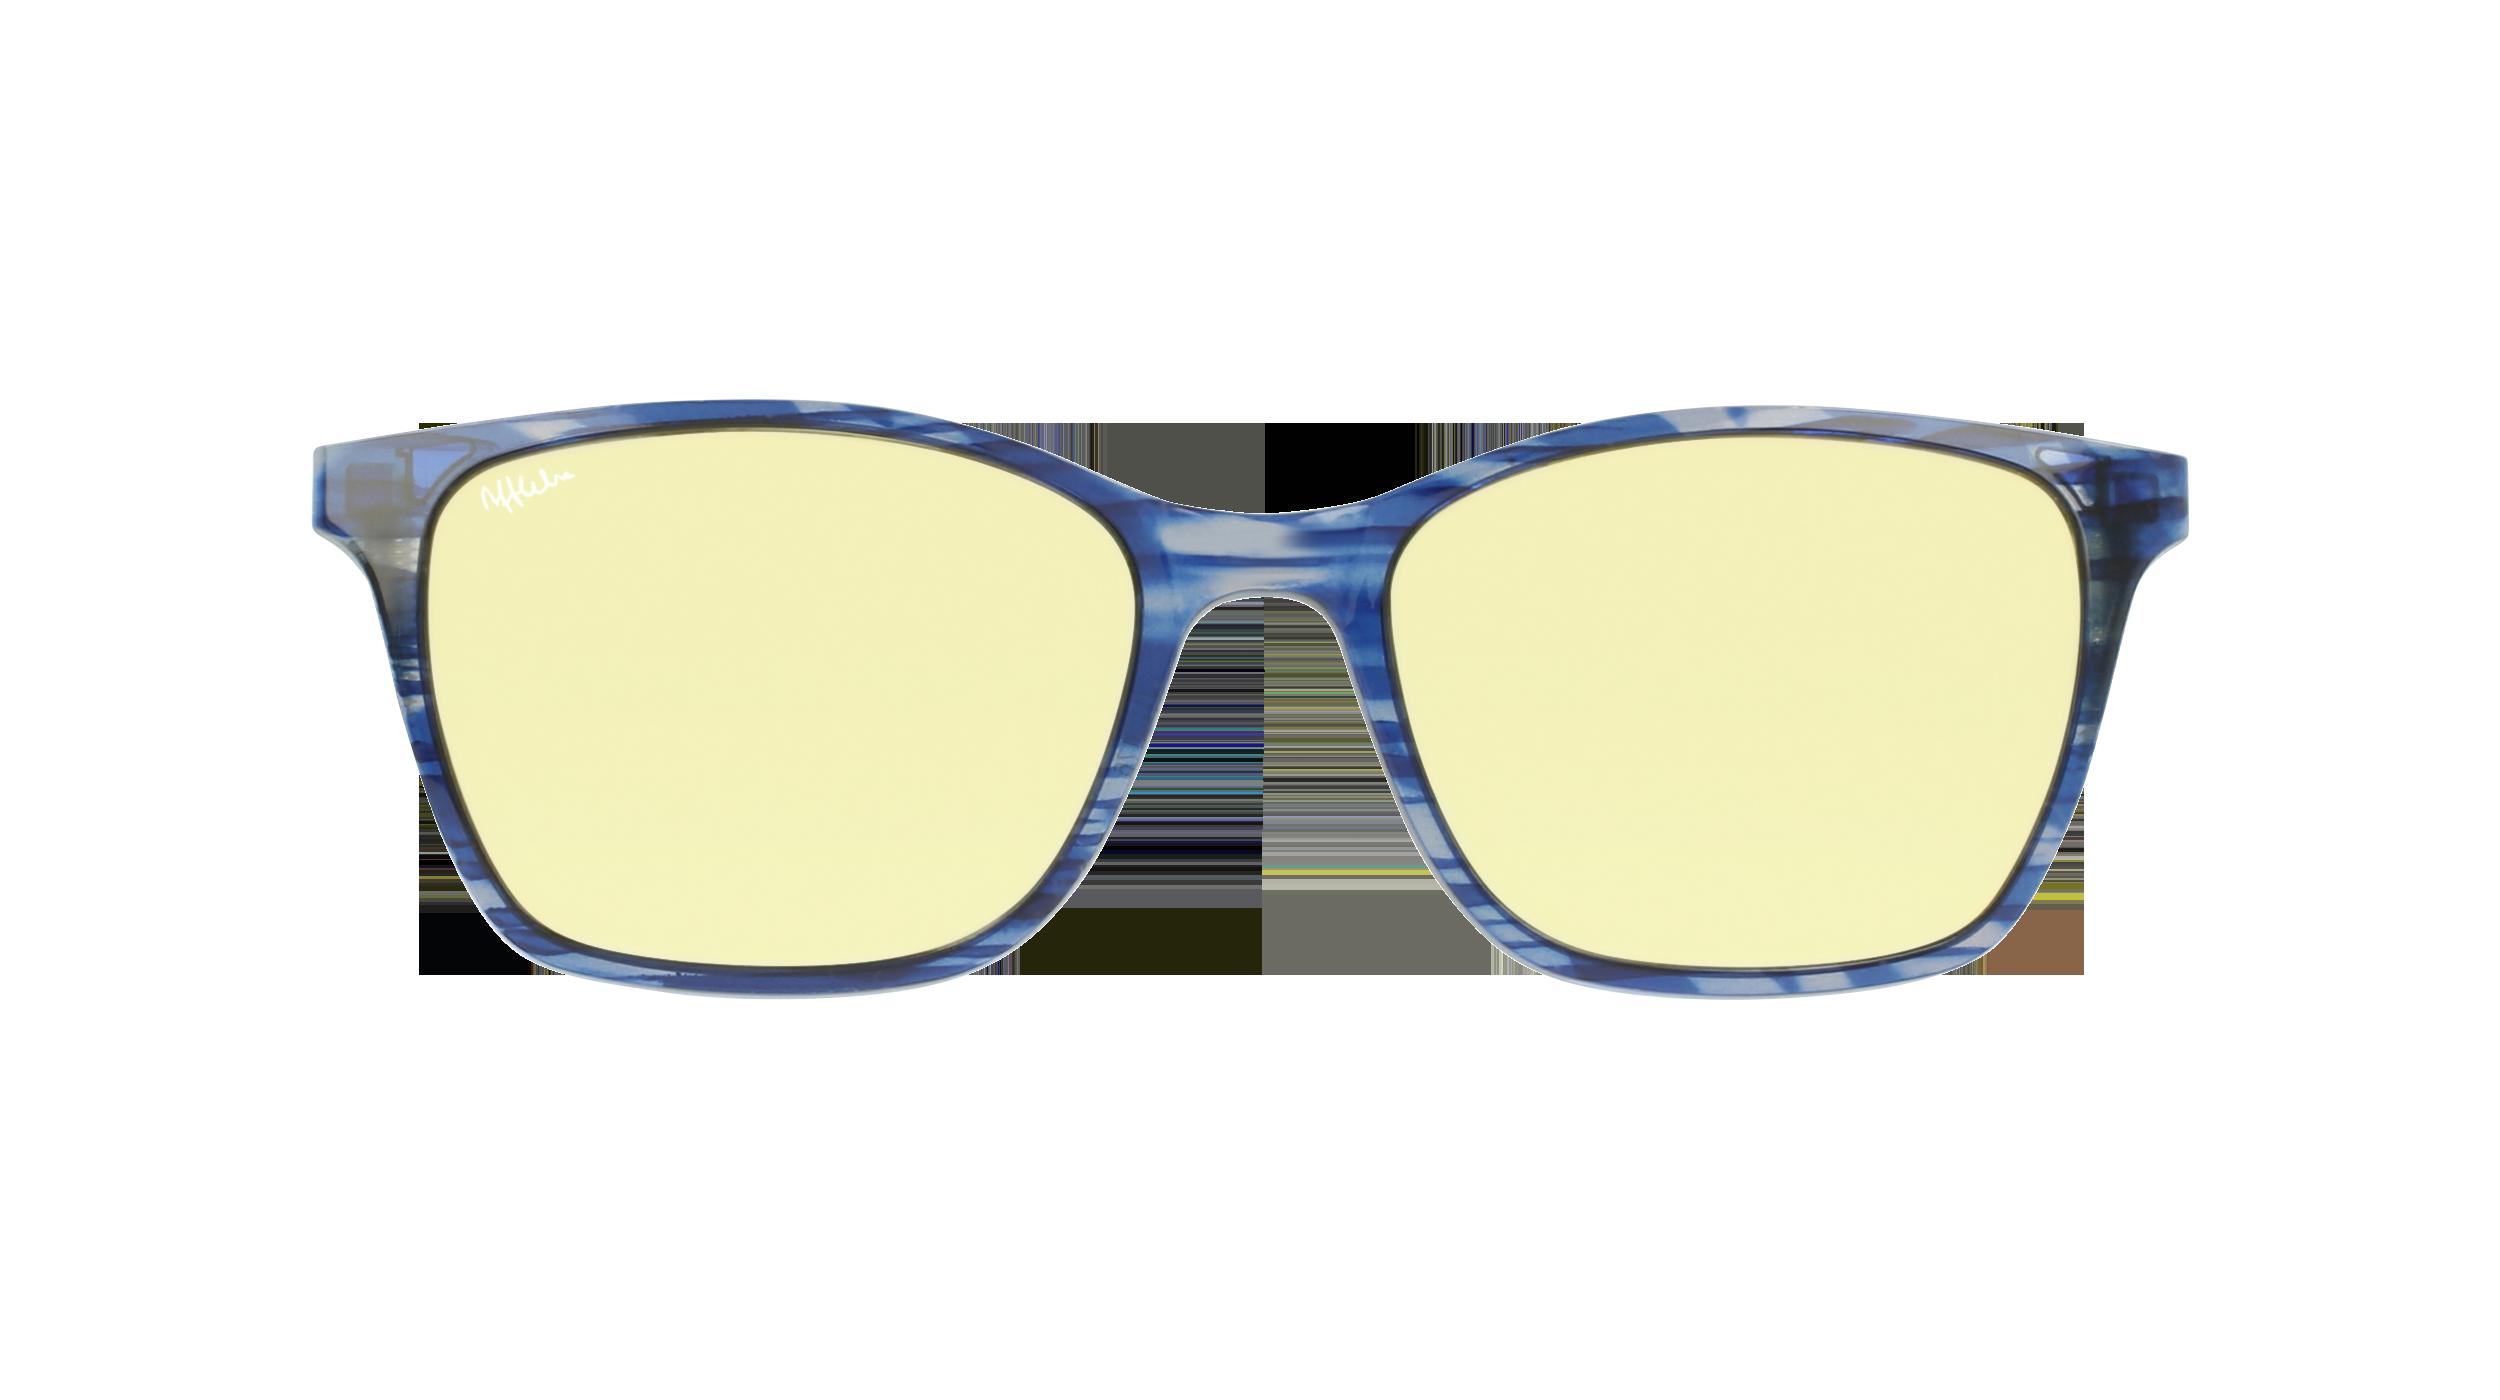 afflelou/france/products/smart_clip/clips_glasses/07630036457627.png